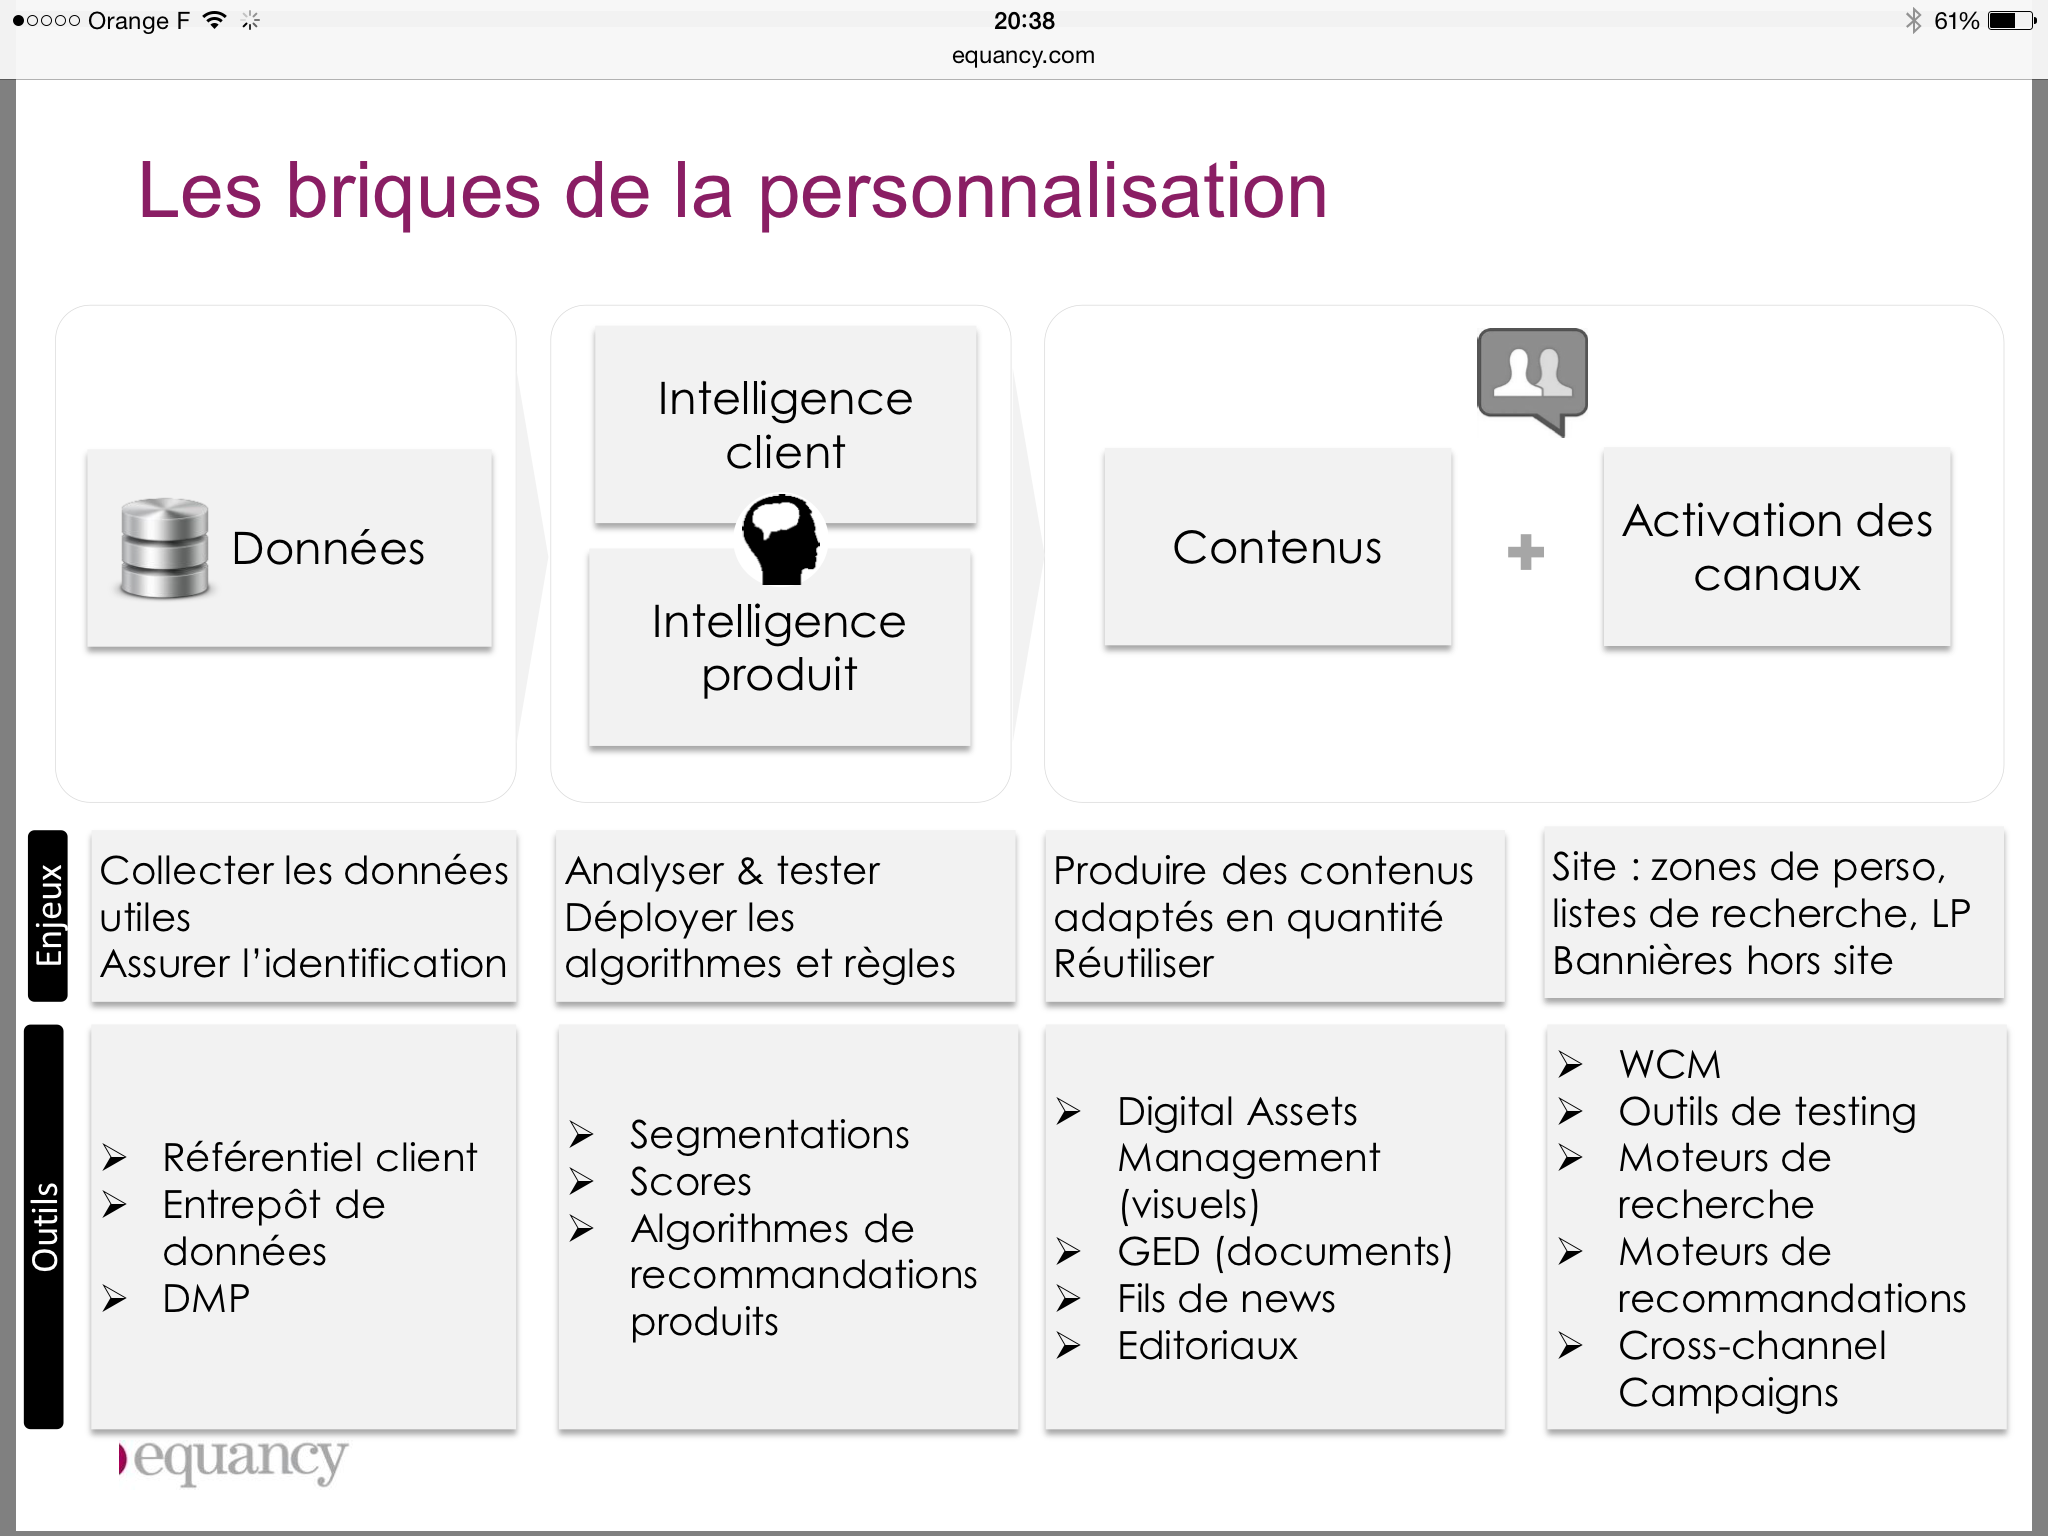 PersonnalisationBigData-3-Yann